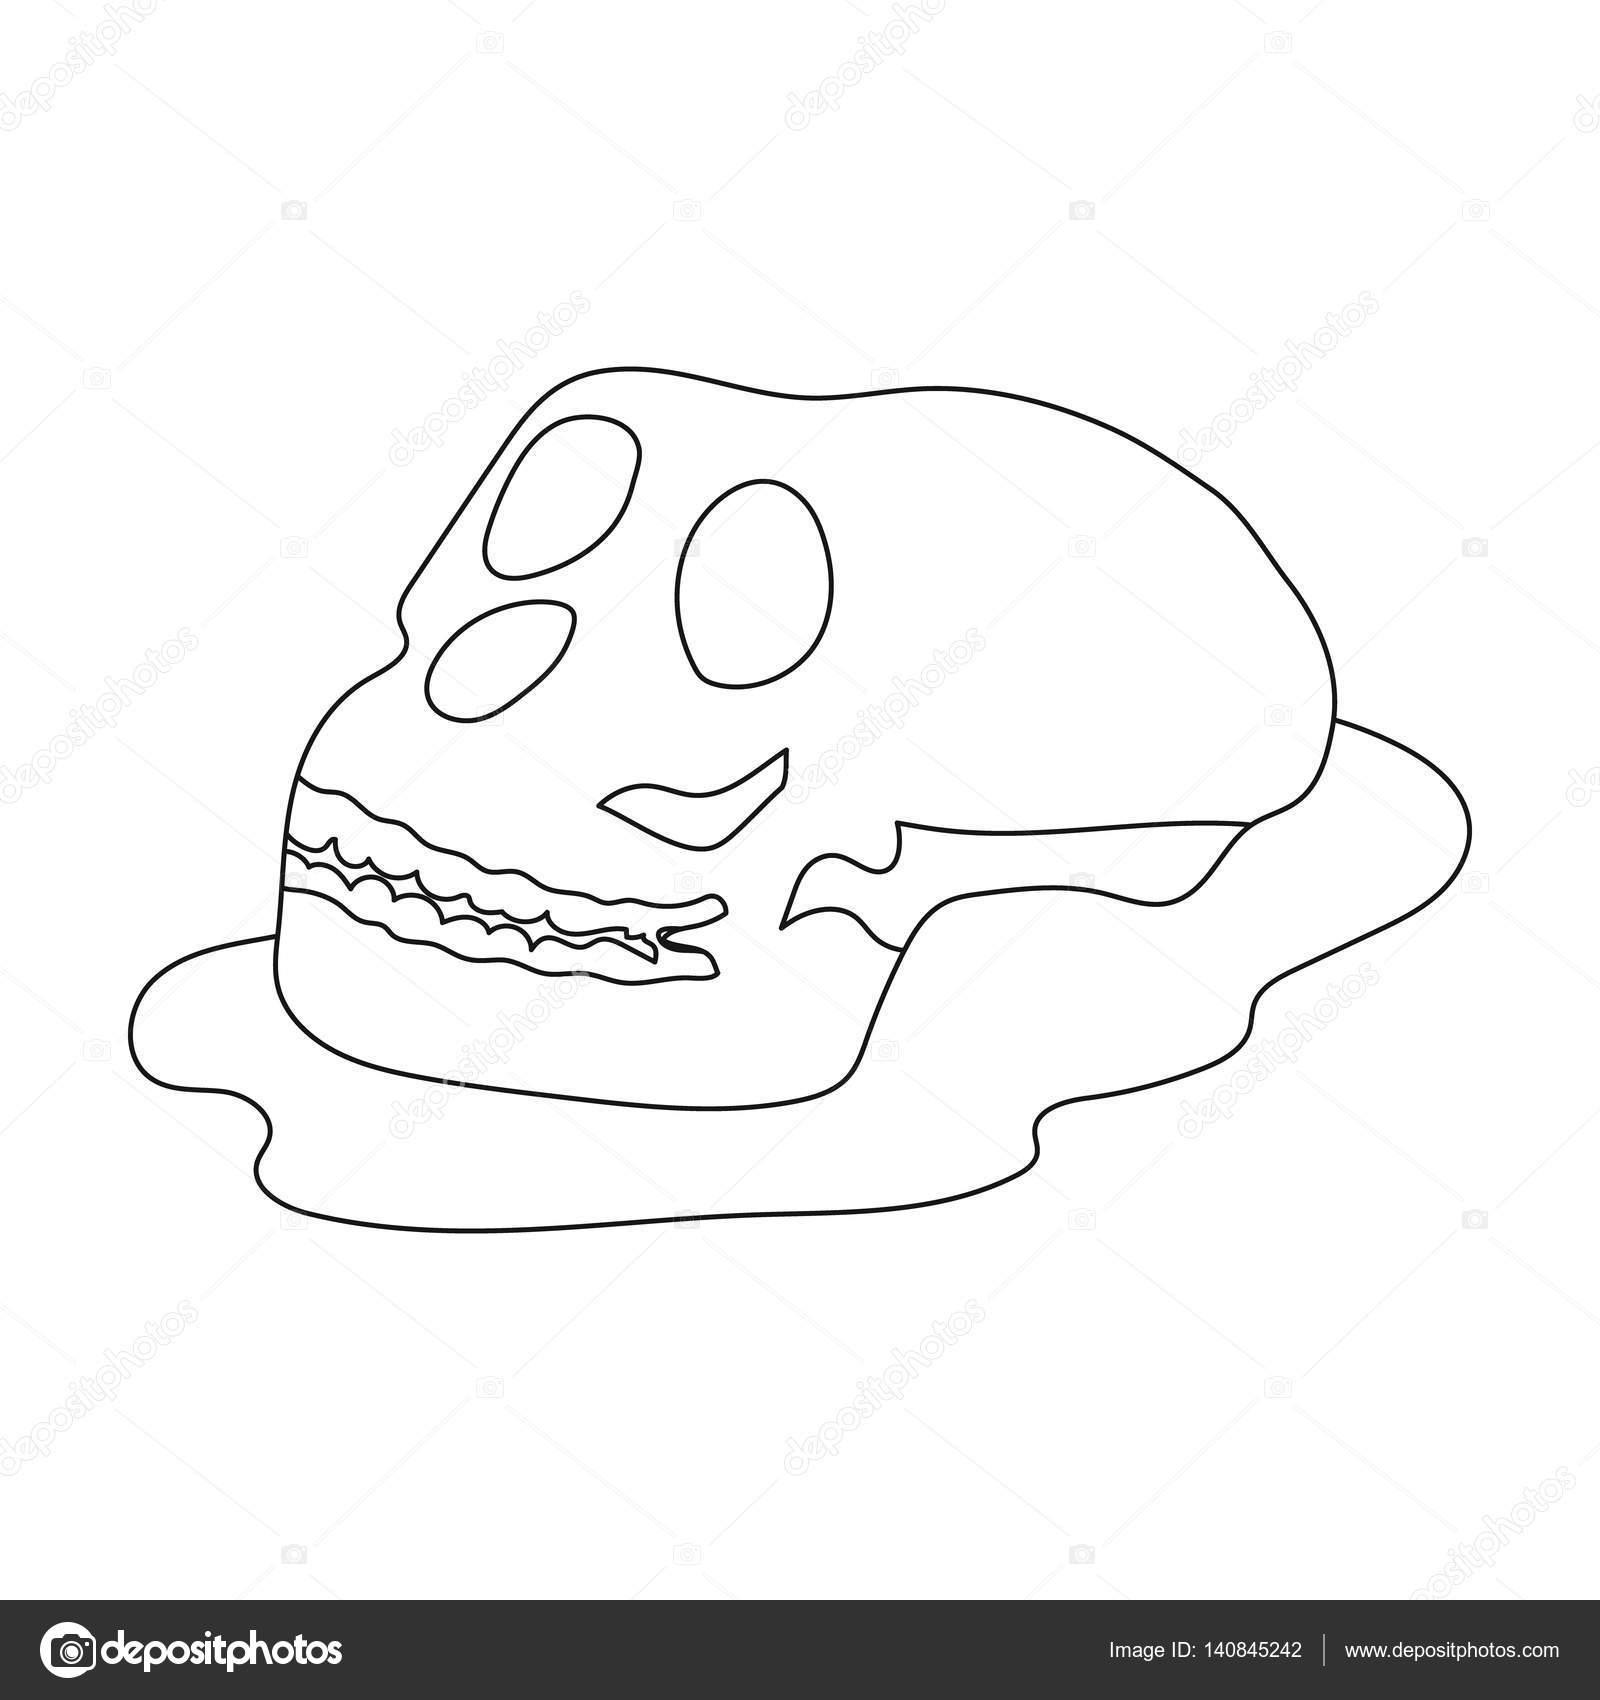 Icono de fósiles humanos en contorno estilo aislado sobre fondo ...